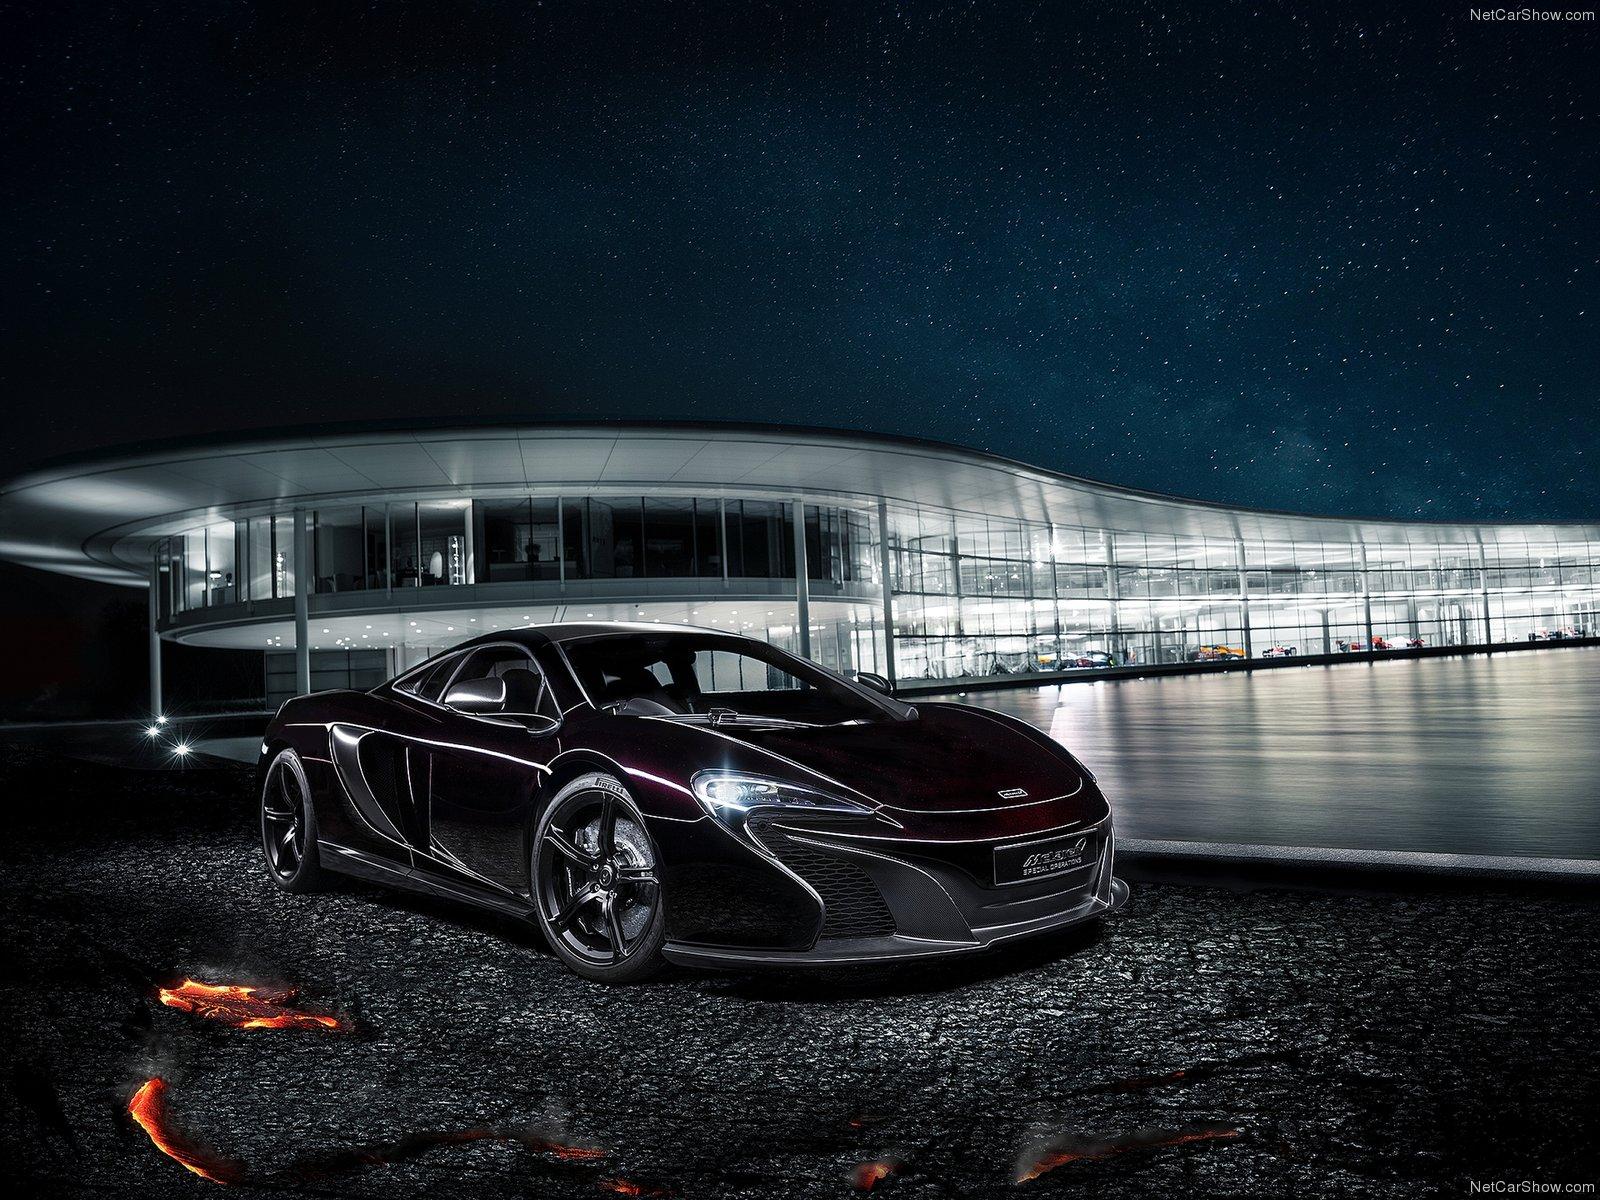 Hình ảnh siêu xe McLaren 650S Coupe MSO Concept 2014 & nội ngoại thất